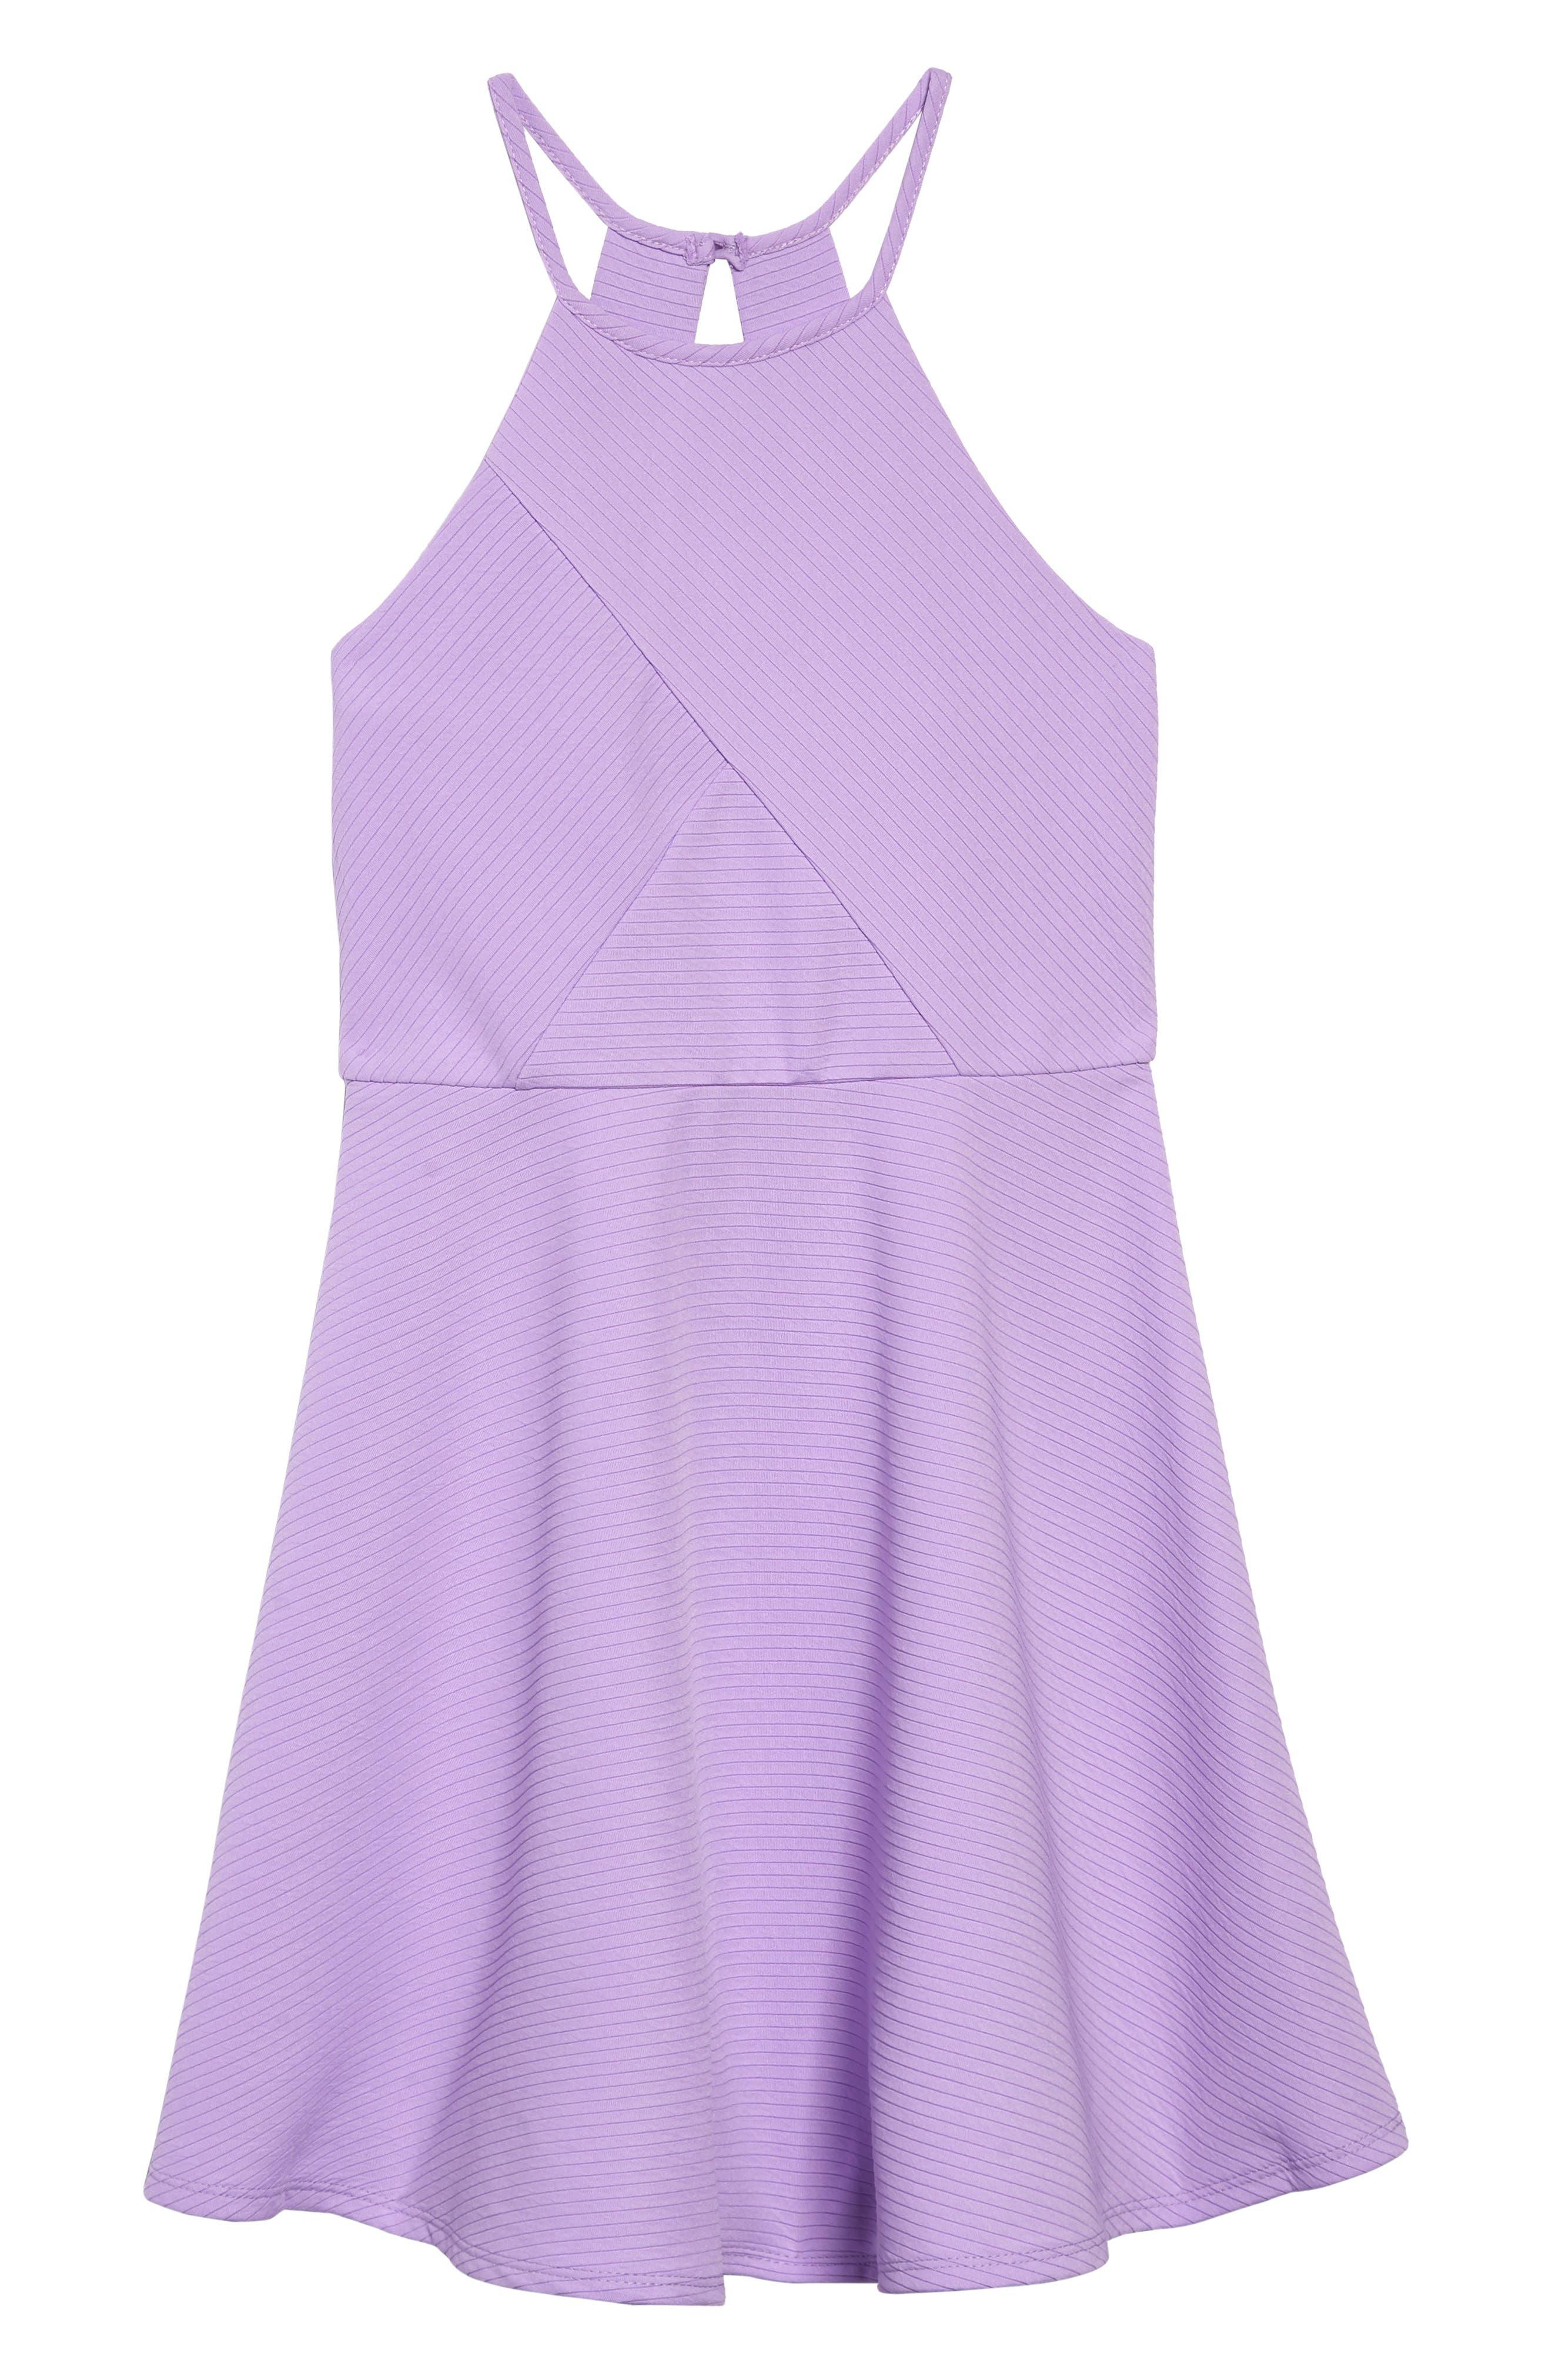 ZUNIE, Textured Skater Dress, Main thumbnail 1, color, LILAC